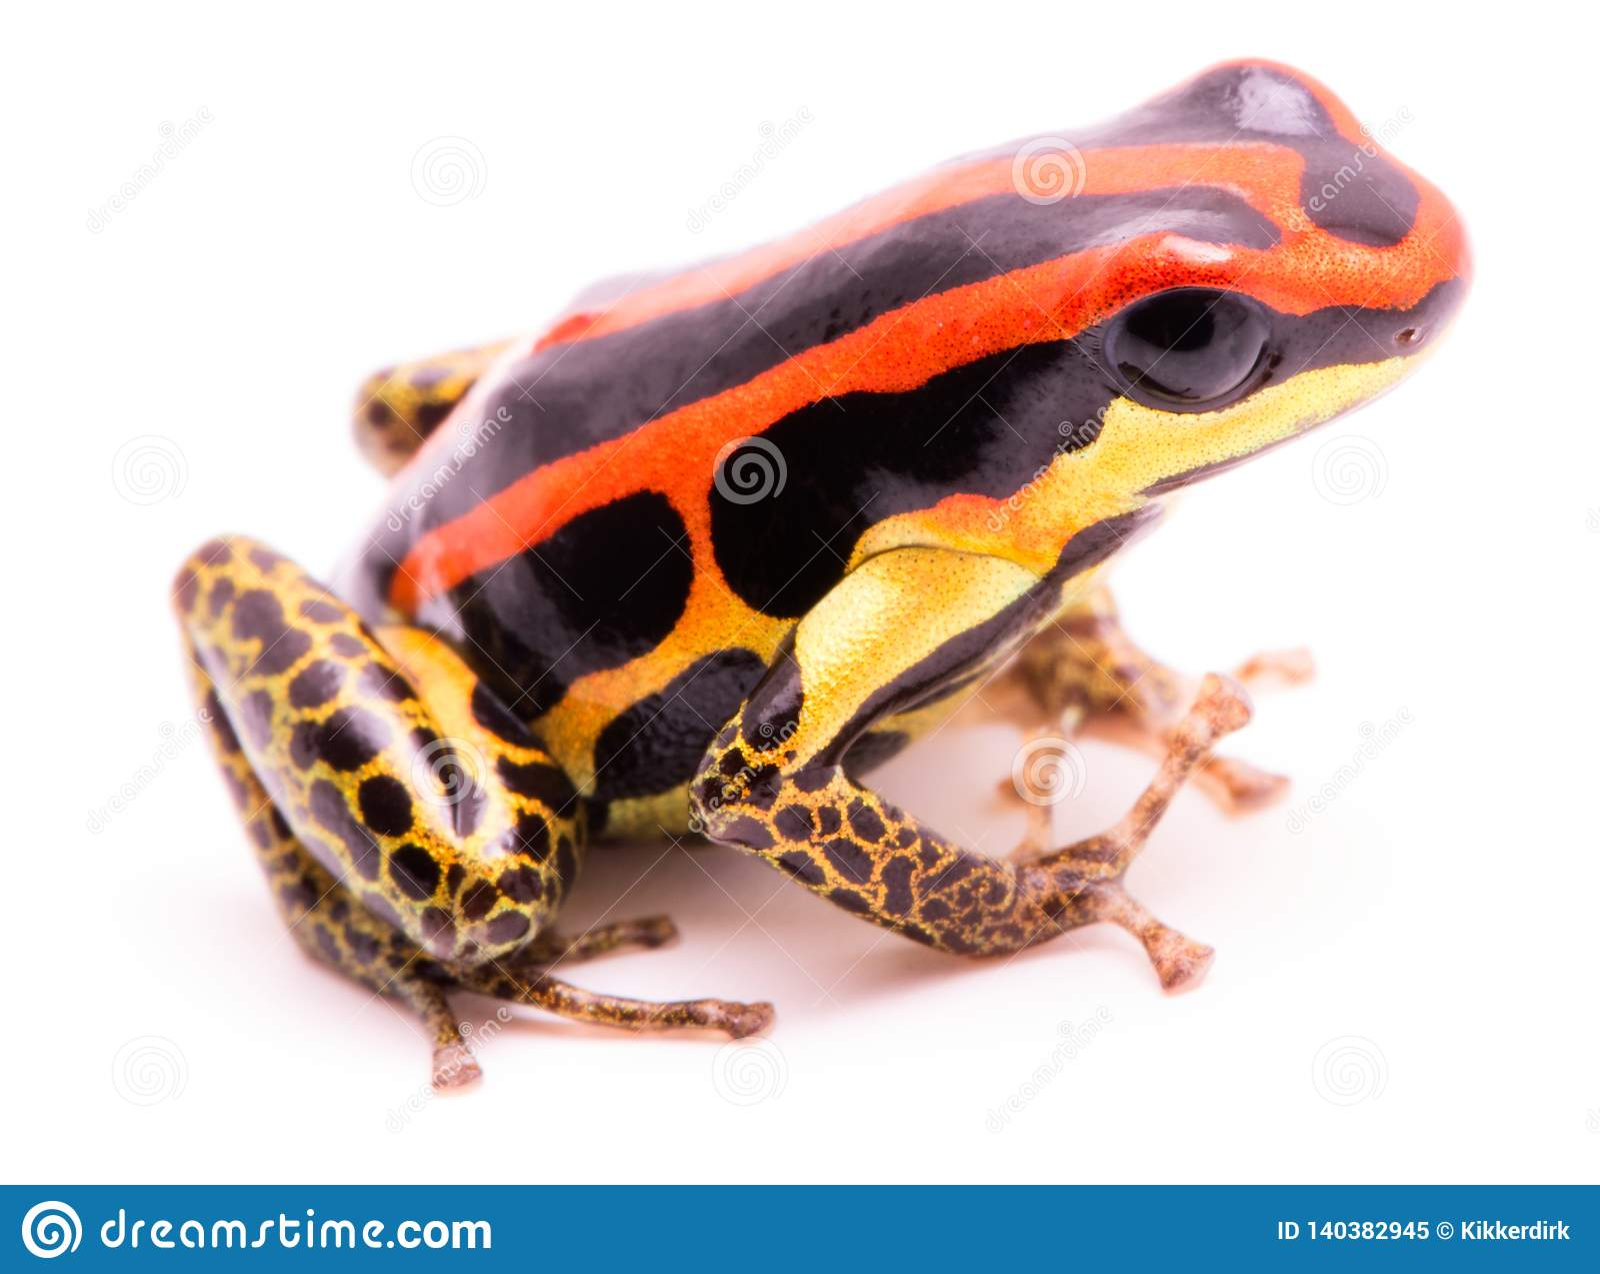 Poison dart or arrow frog, Ranitomeya uakarii golden legs morph